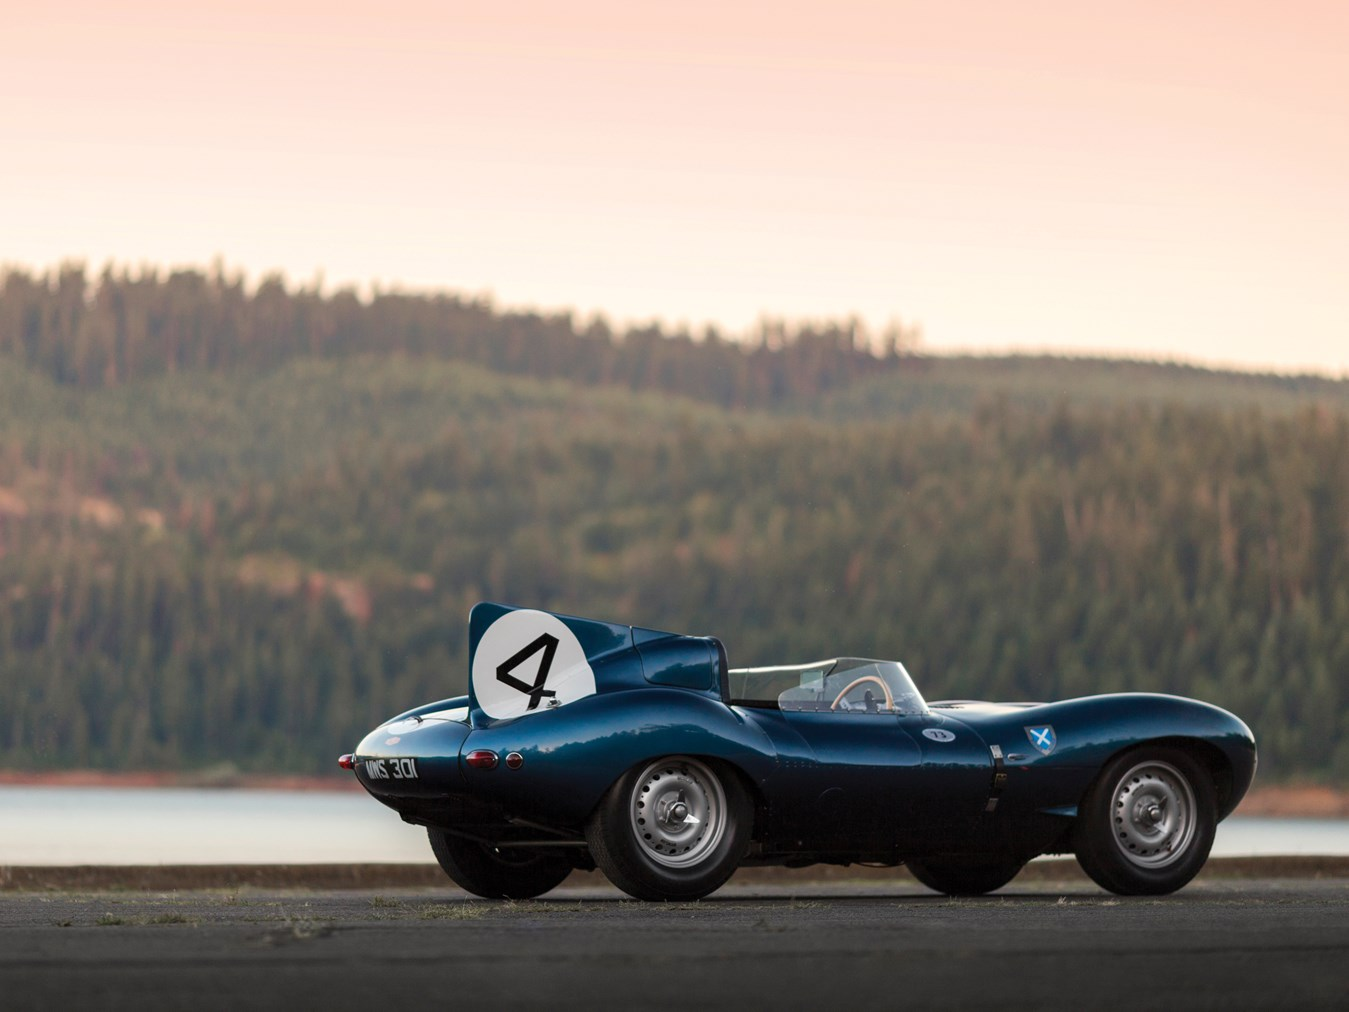 Le Mans Winning Jaguar D Type Sets Record Price For